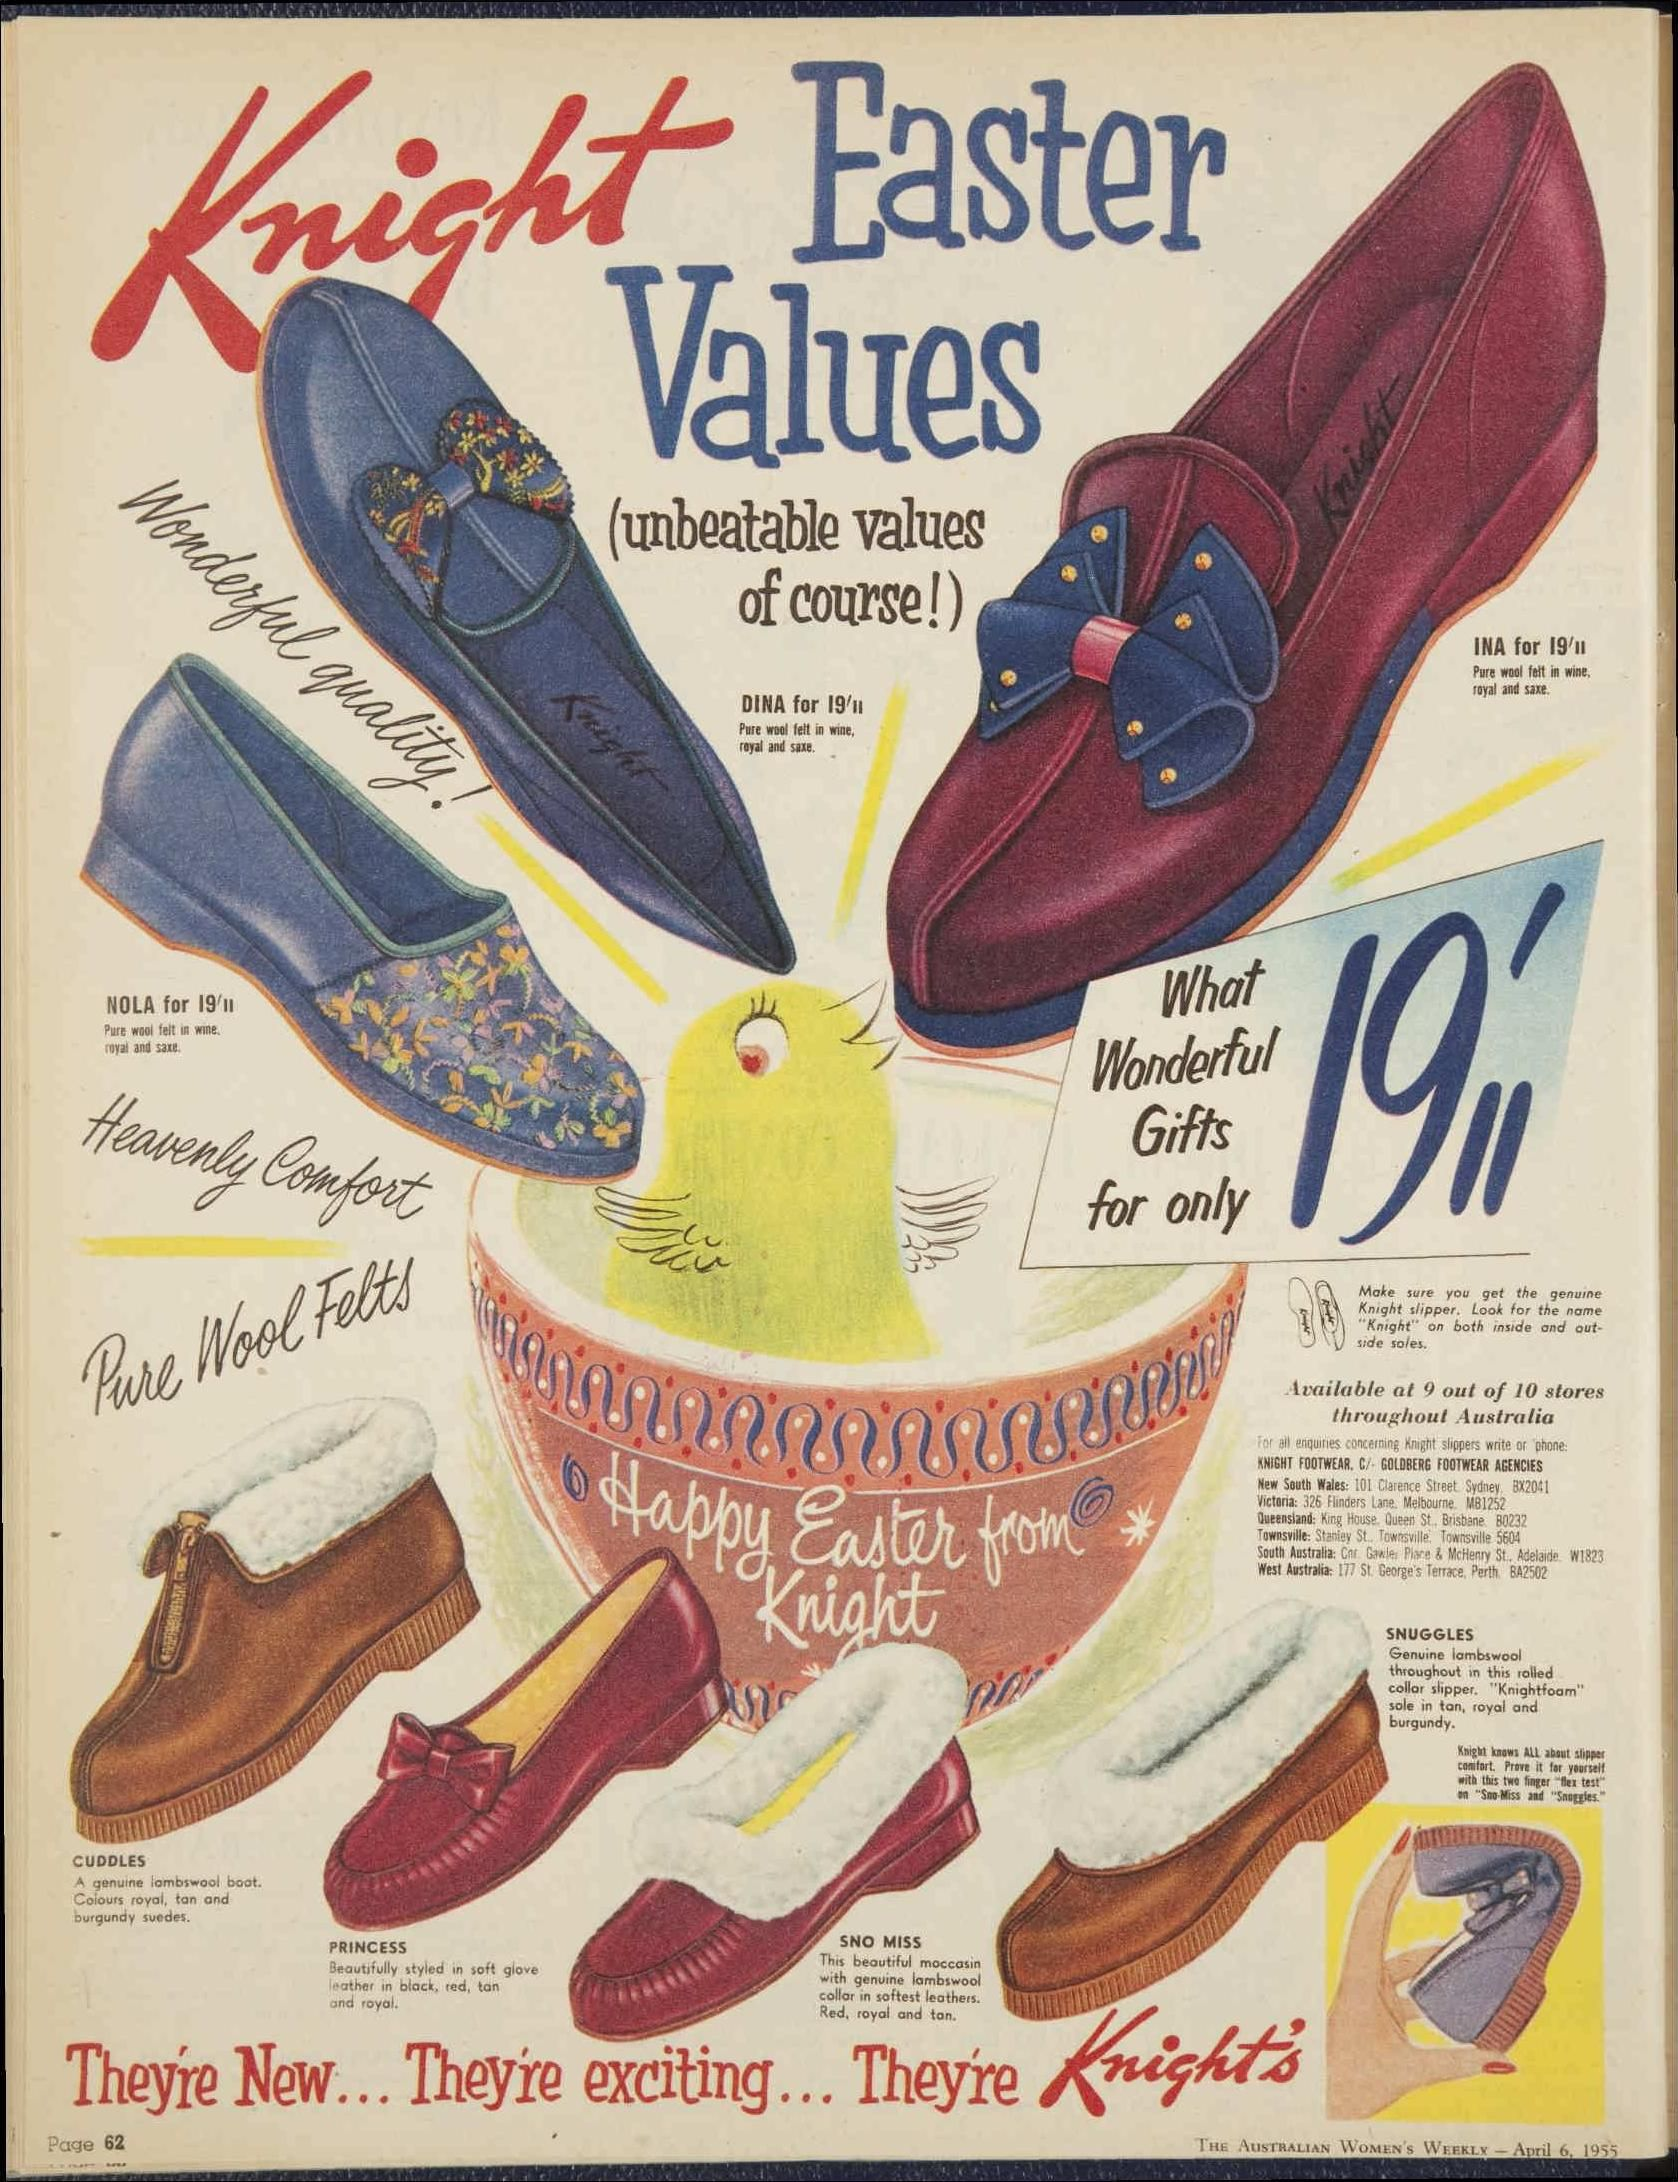 Issue 6 Apr 1955 The Australian Women S Week Childhood Memories Toys Vintage Advertisements Historical Newspaper